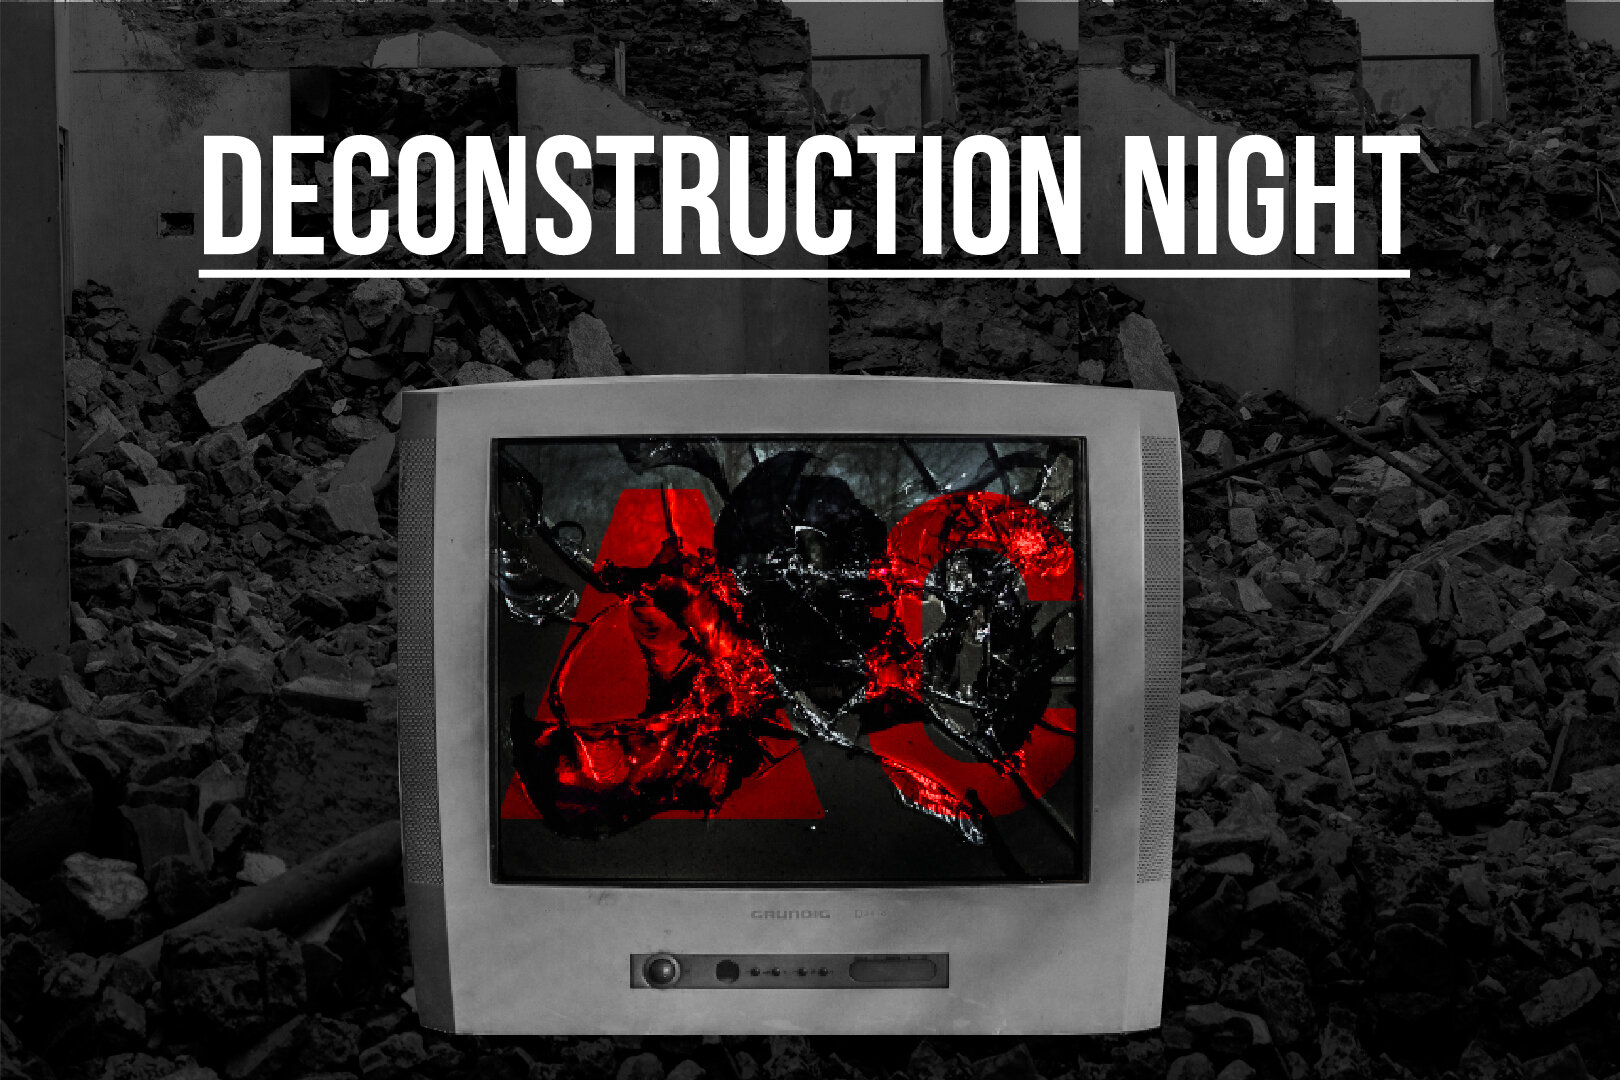 Deconstruction Night Video ImageArtboard 6-100.jpg